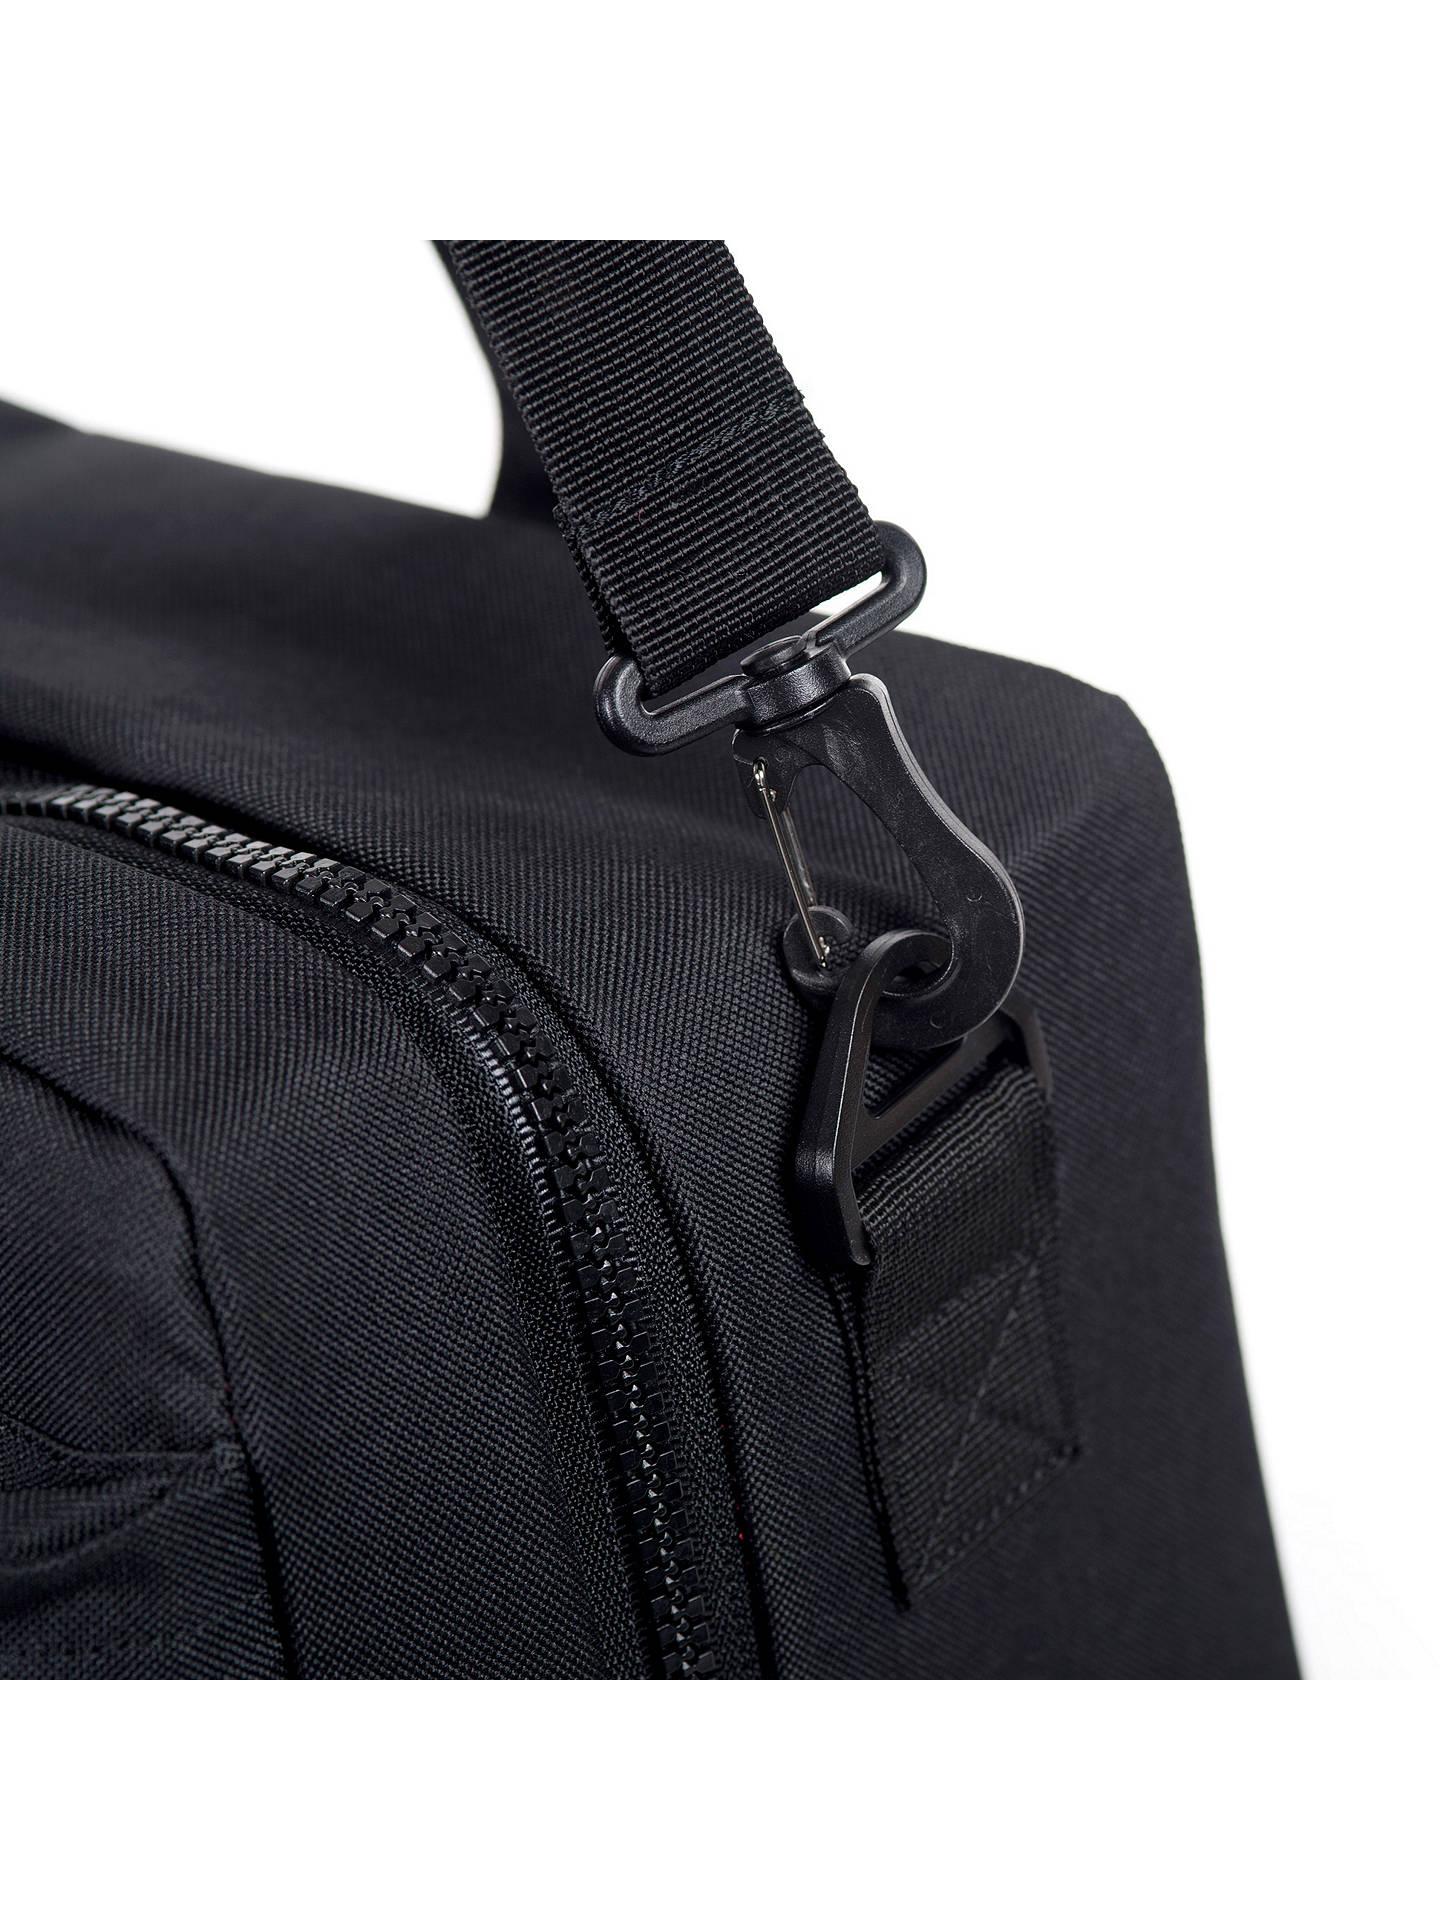 db5f489611 ... Buy Herschel Supply Co. Bowen Travel Duffle Bag